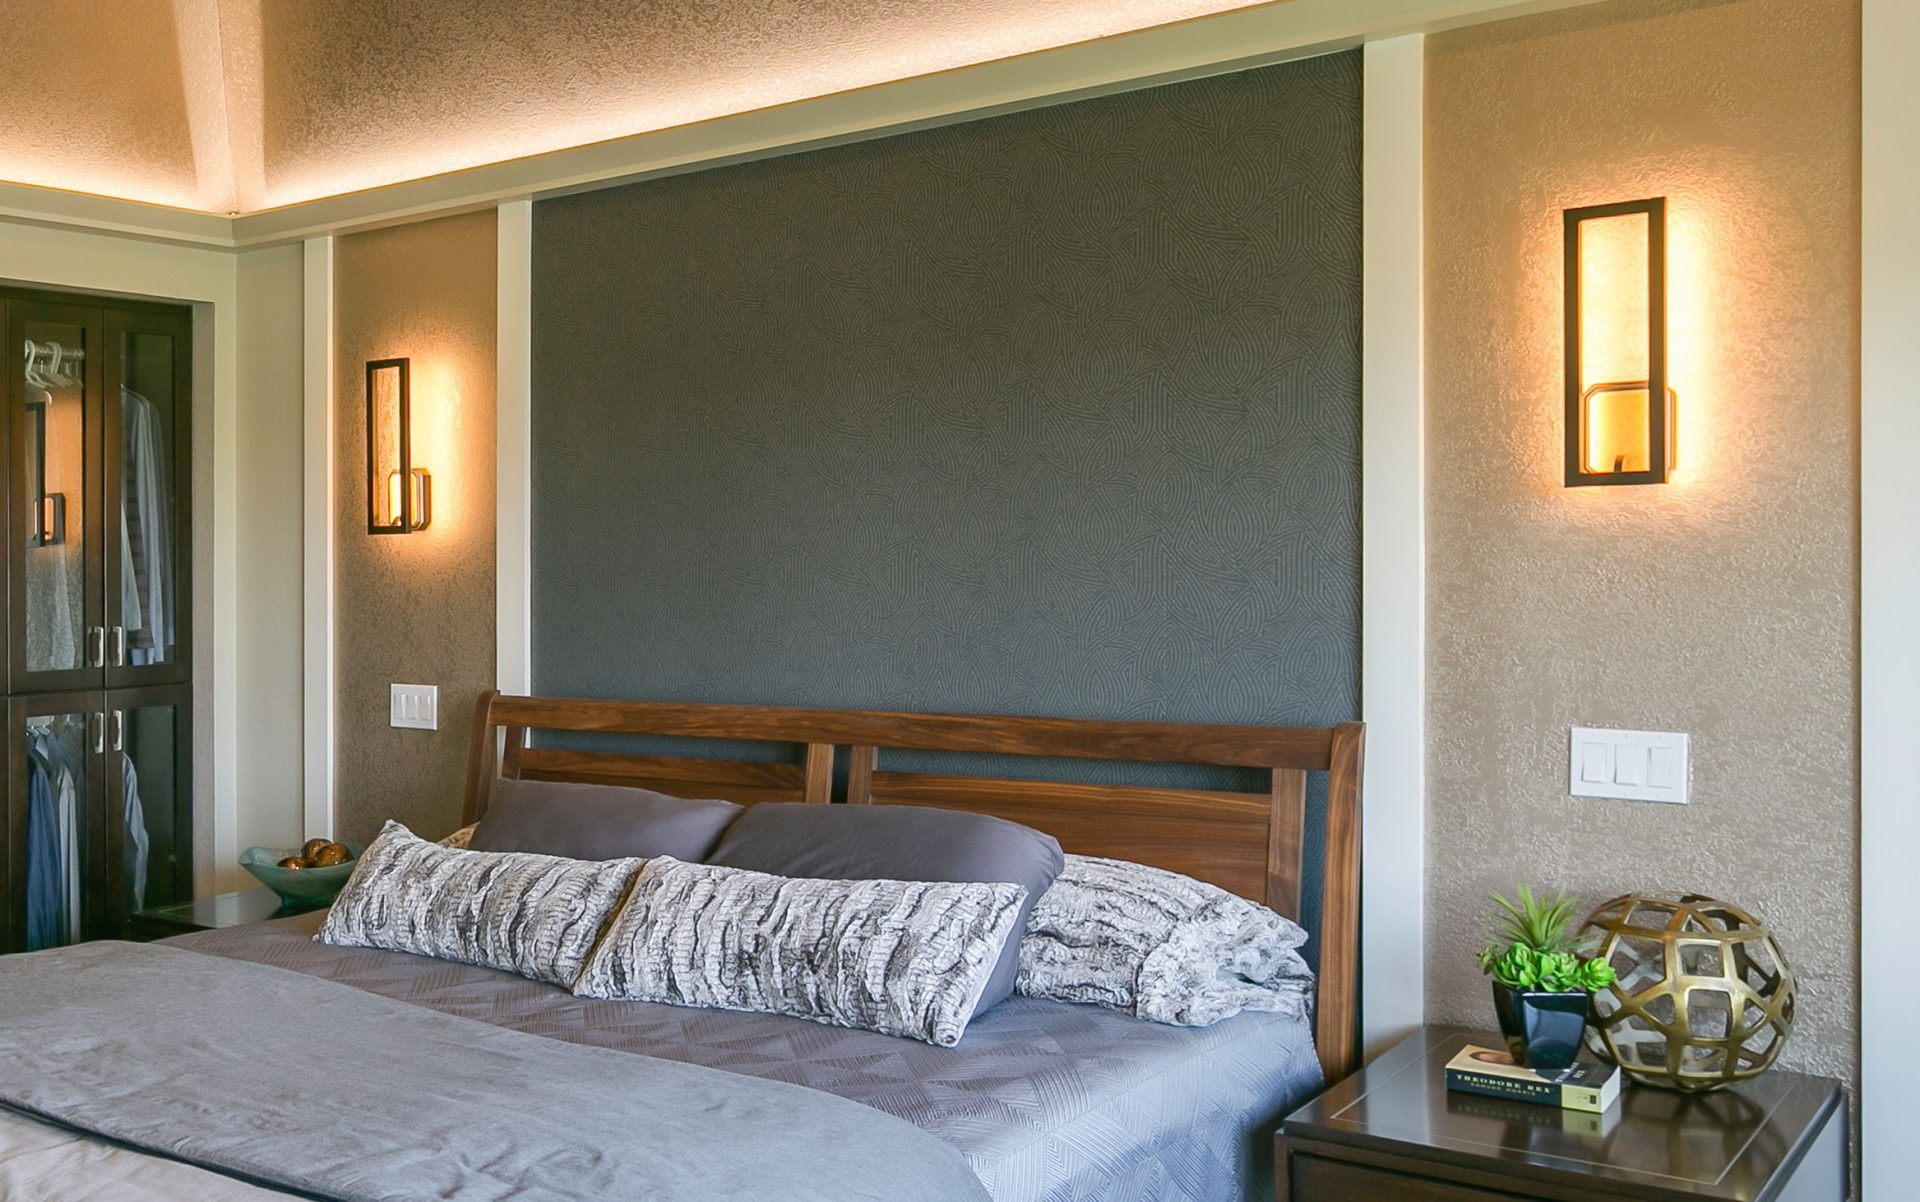 Bedroom modern decorations